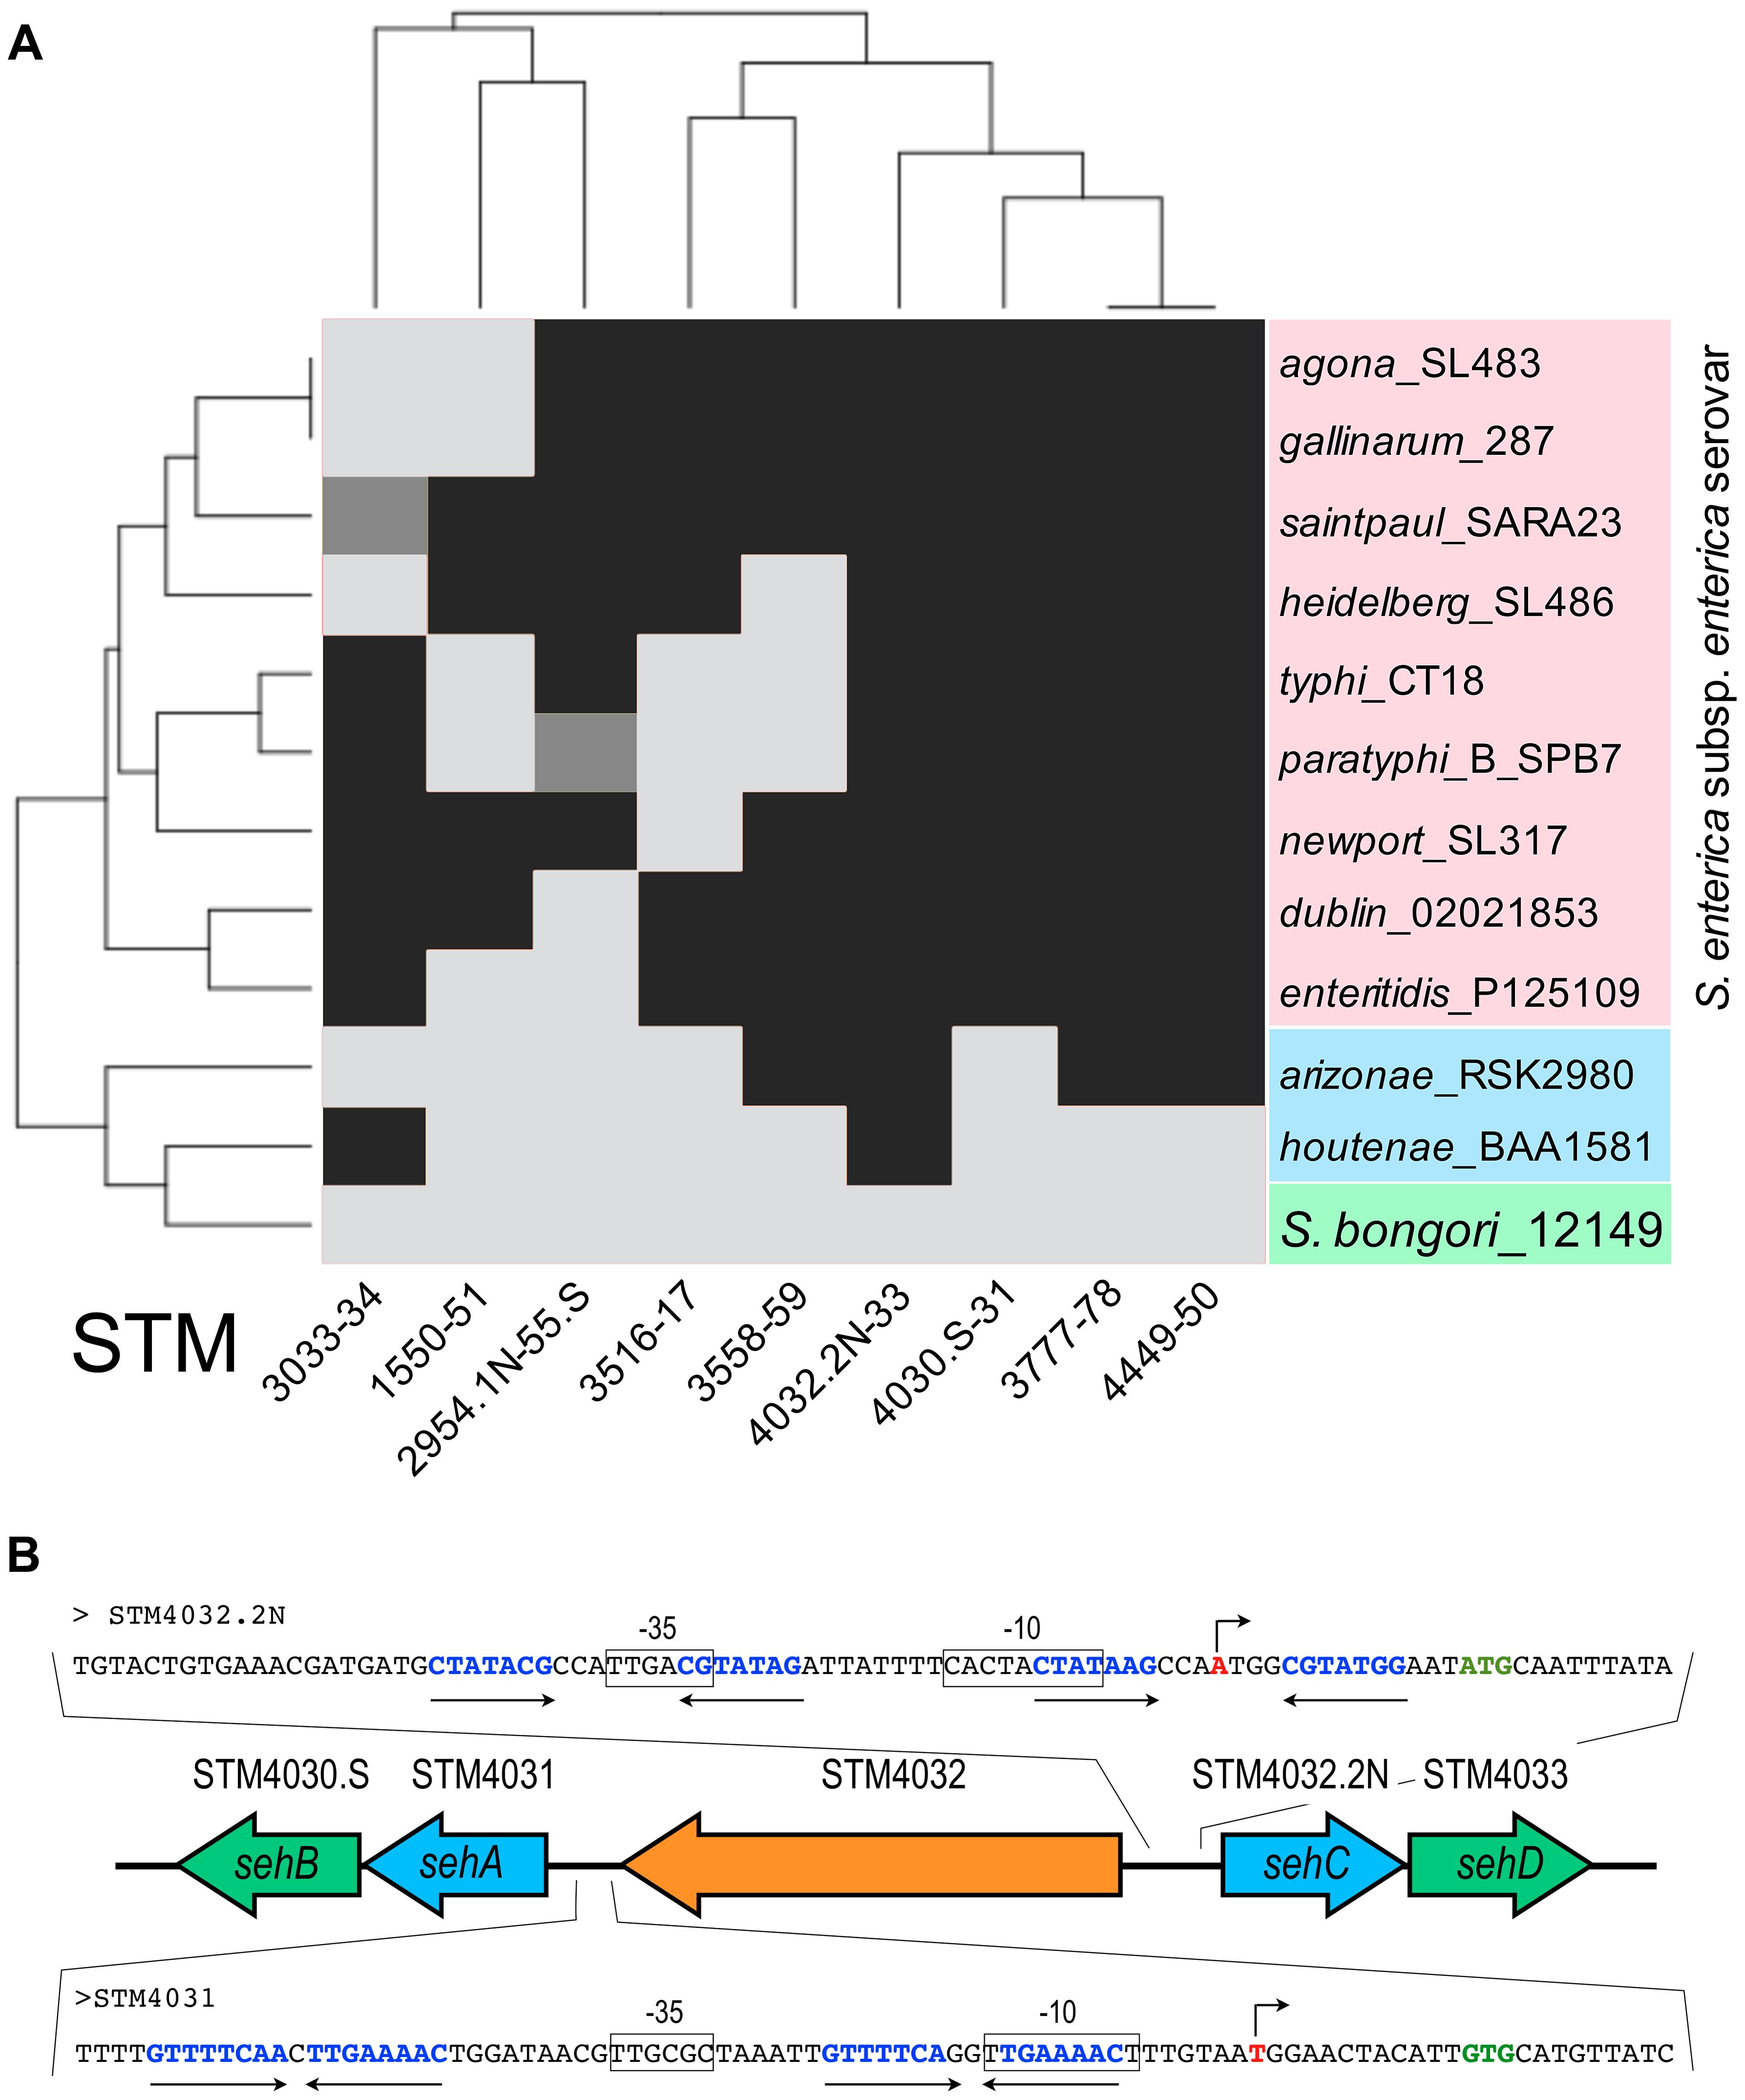 Conservation of TA modules across the genus <i>Salmonella</i>.